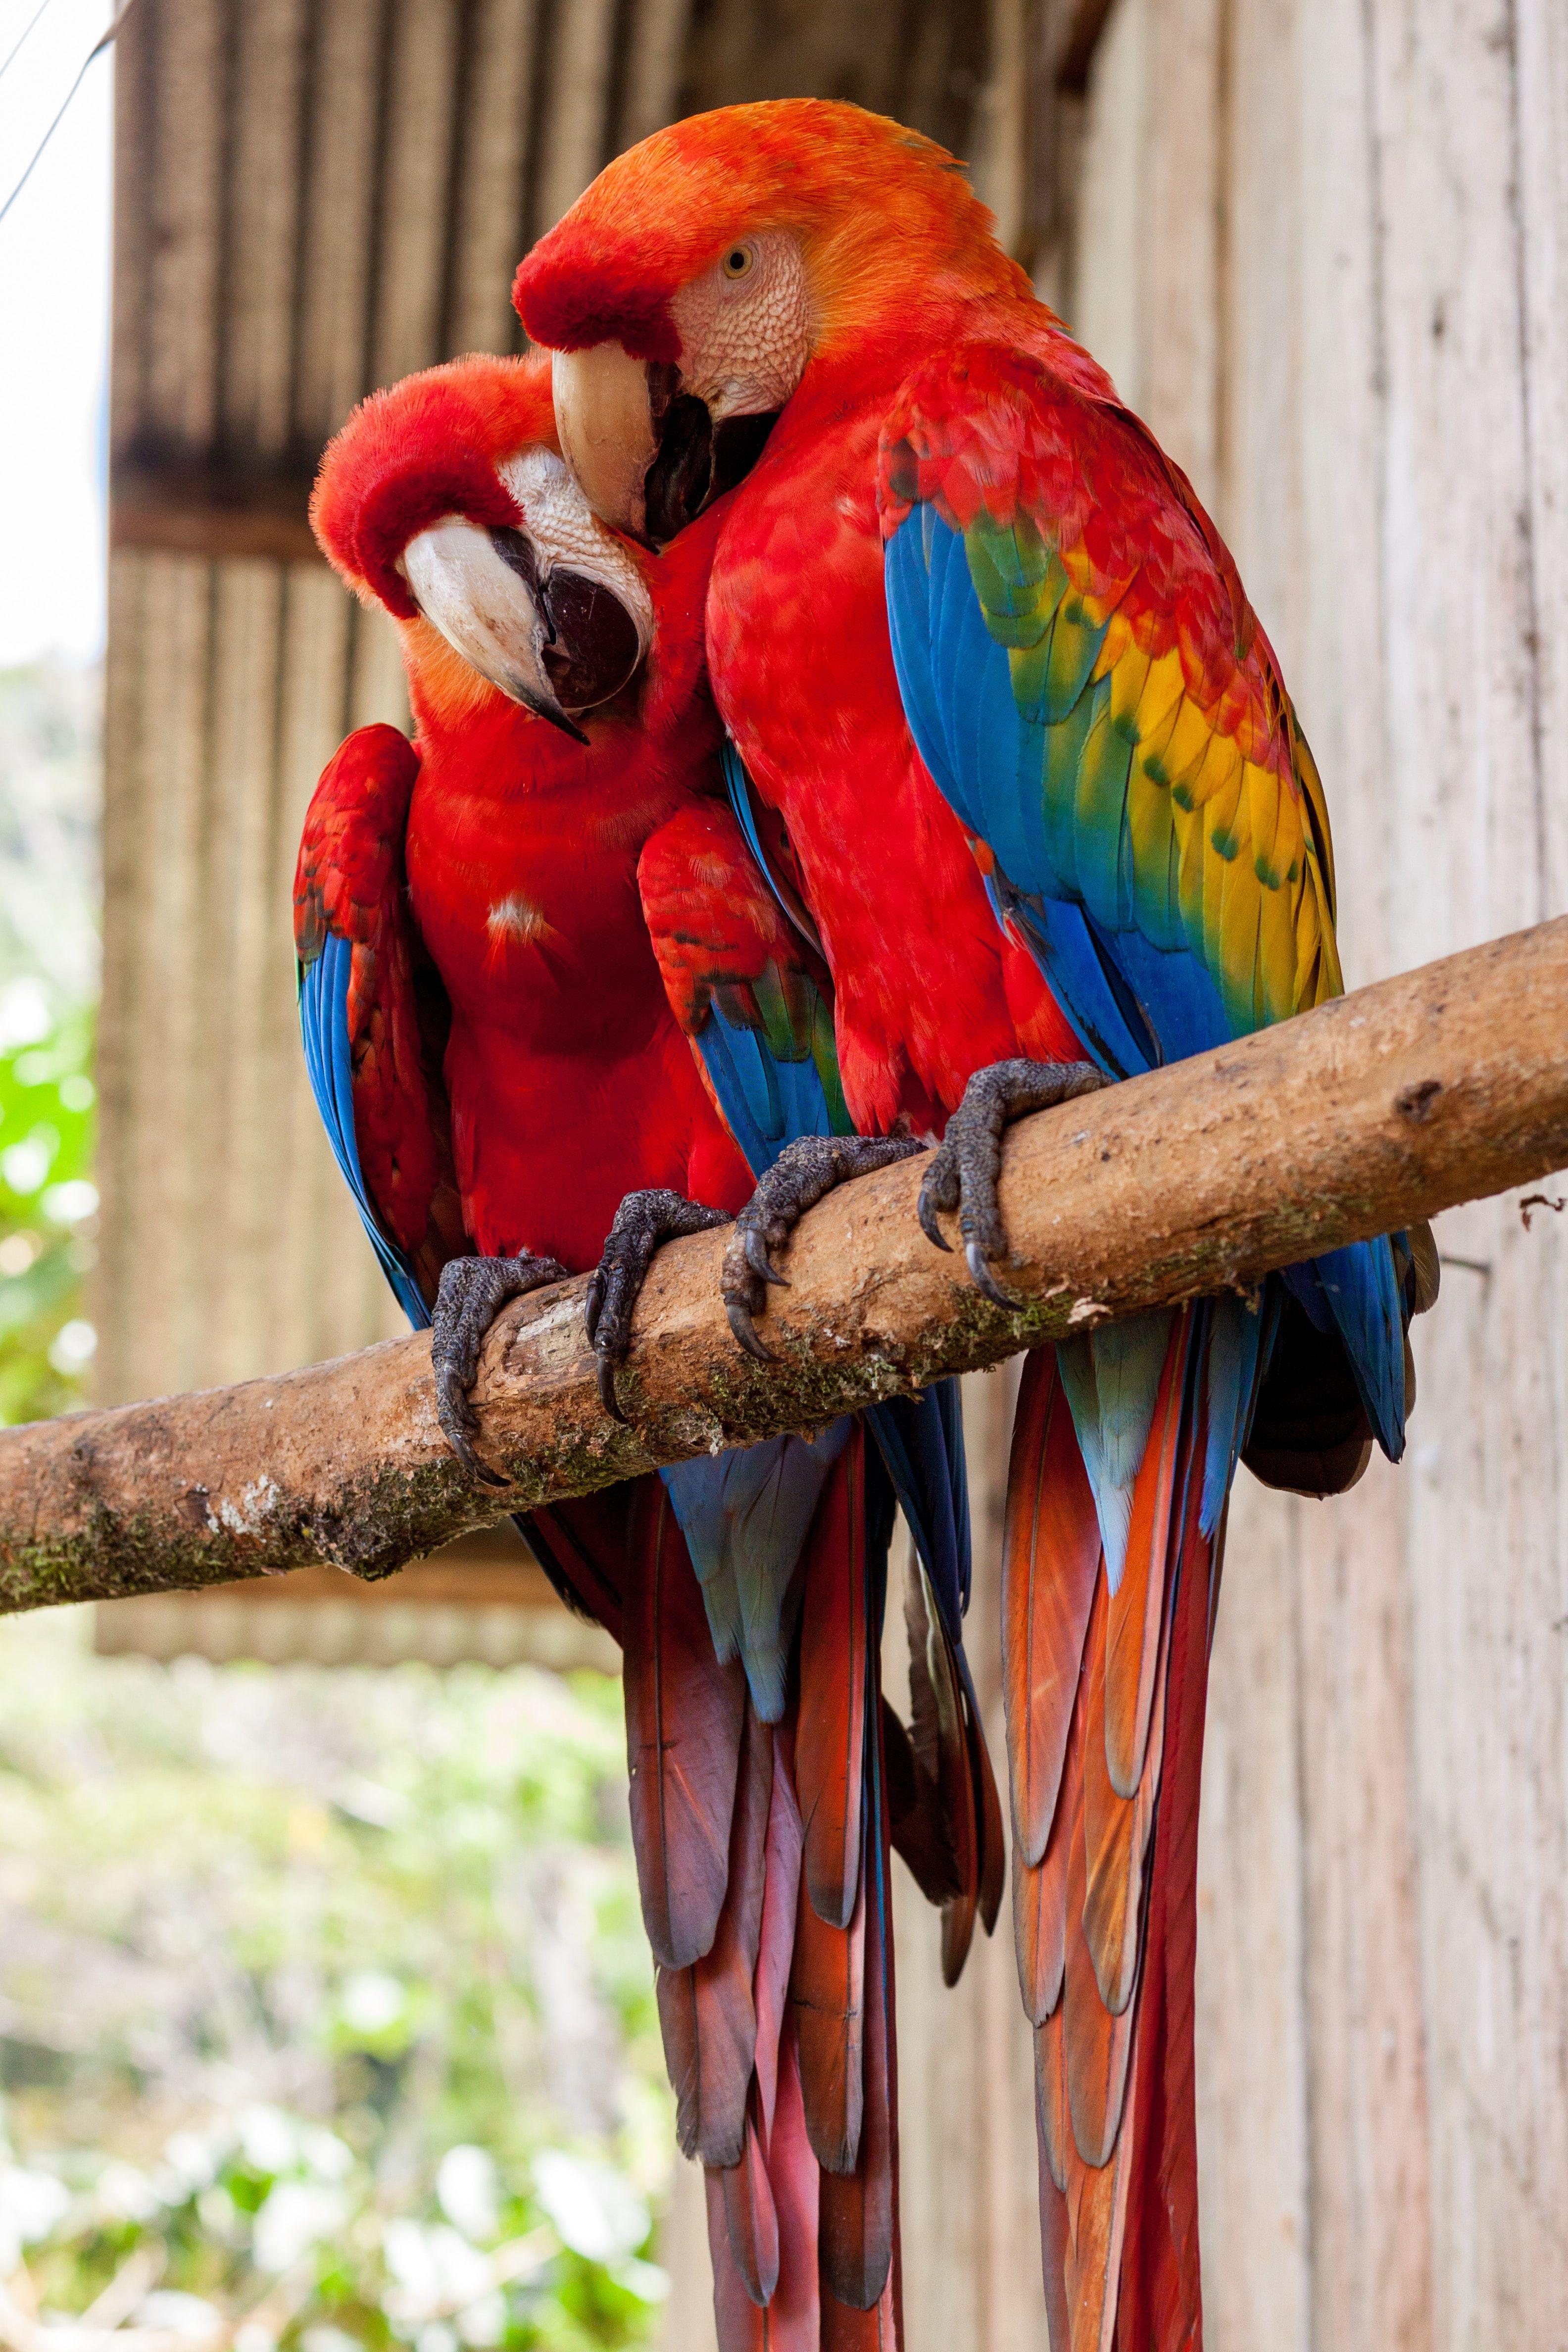 Watch beautiful parrots having lots of fun at the Cute